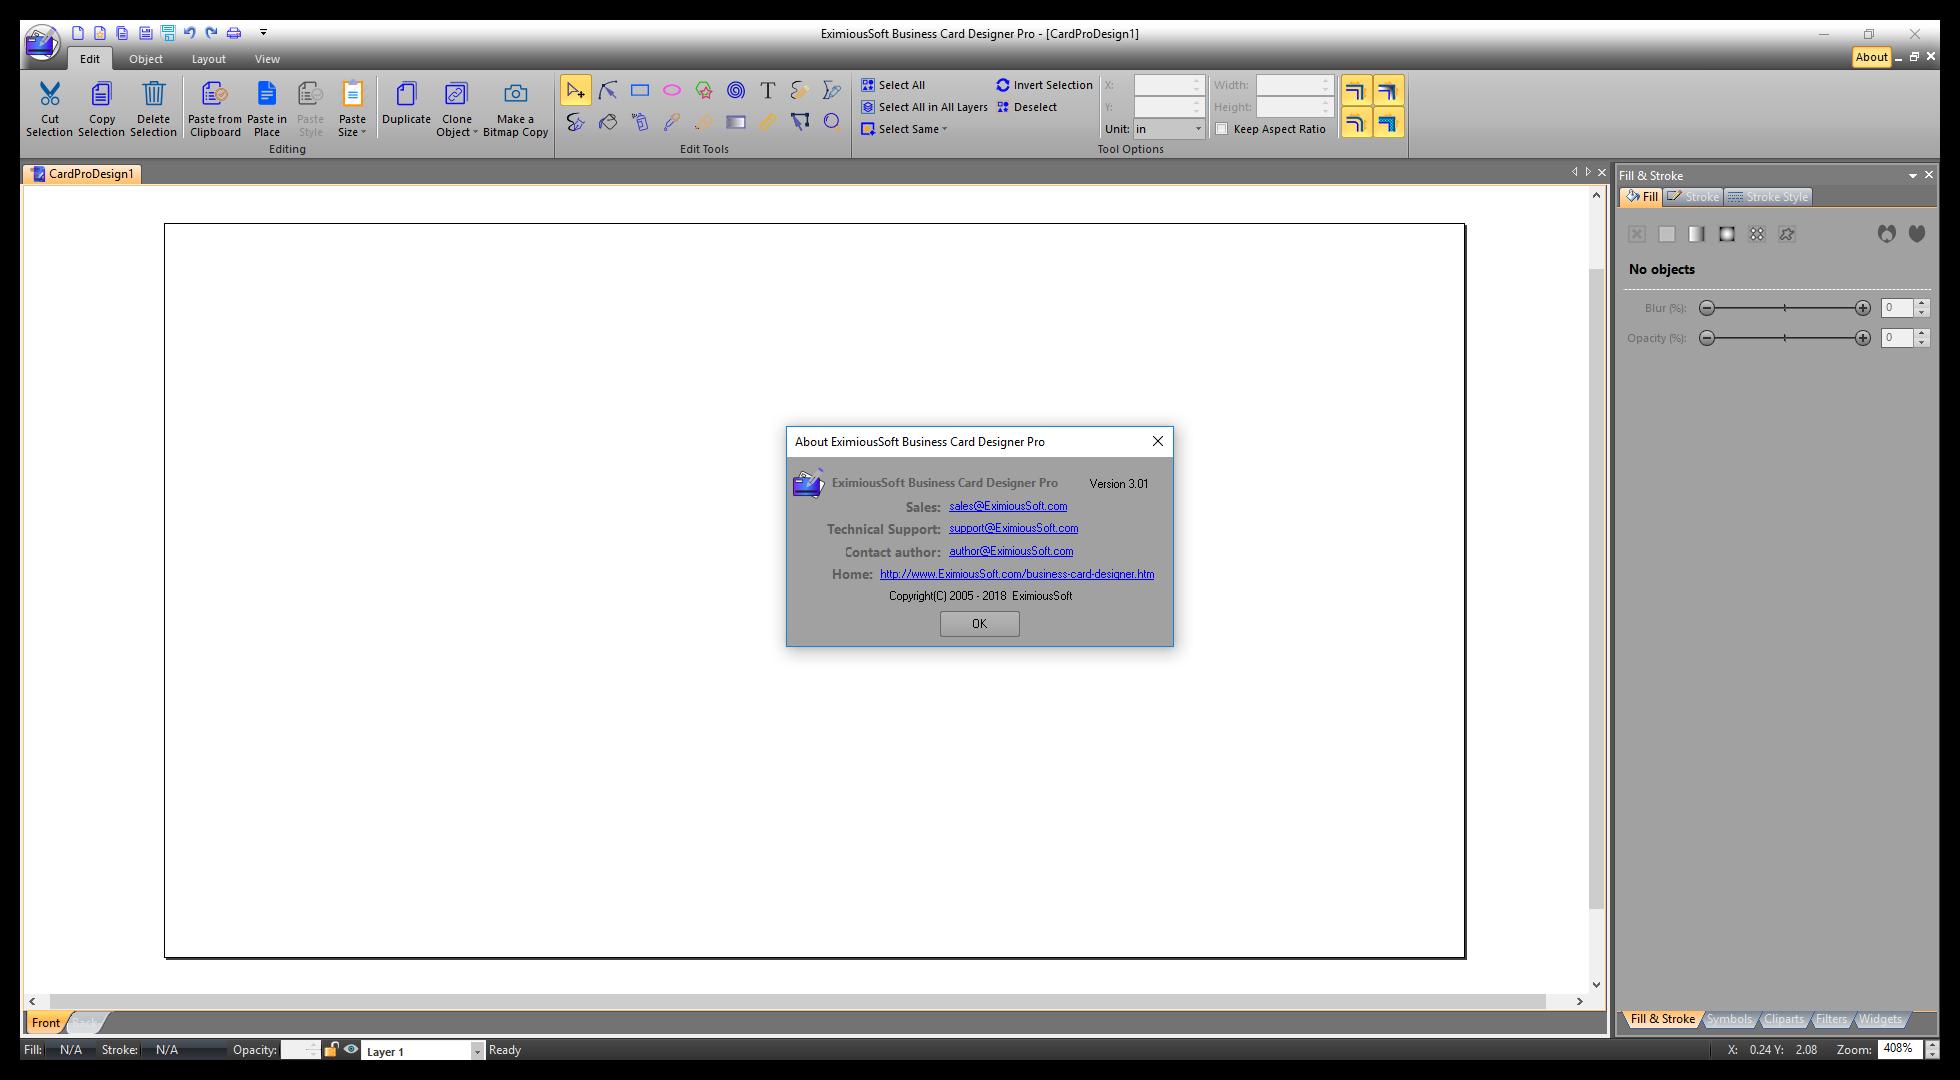 Direct - Eximioussoft Business Card Designer Pro 3.01 Portable ...